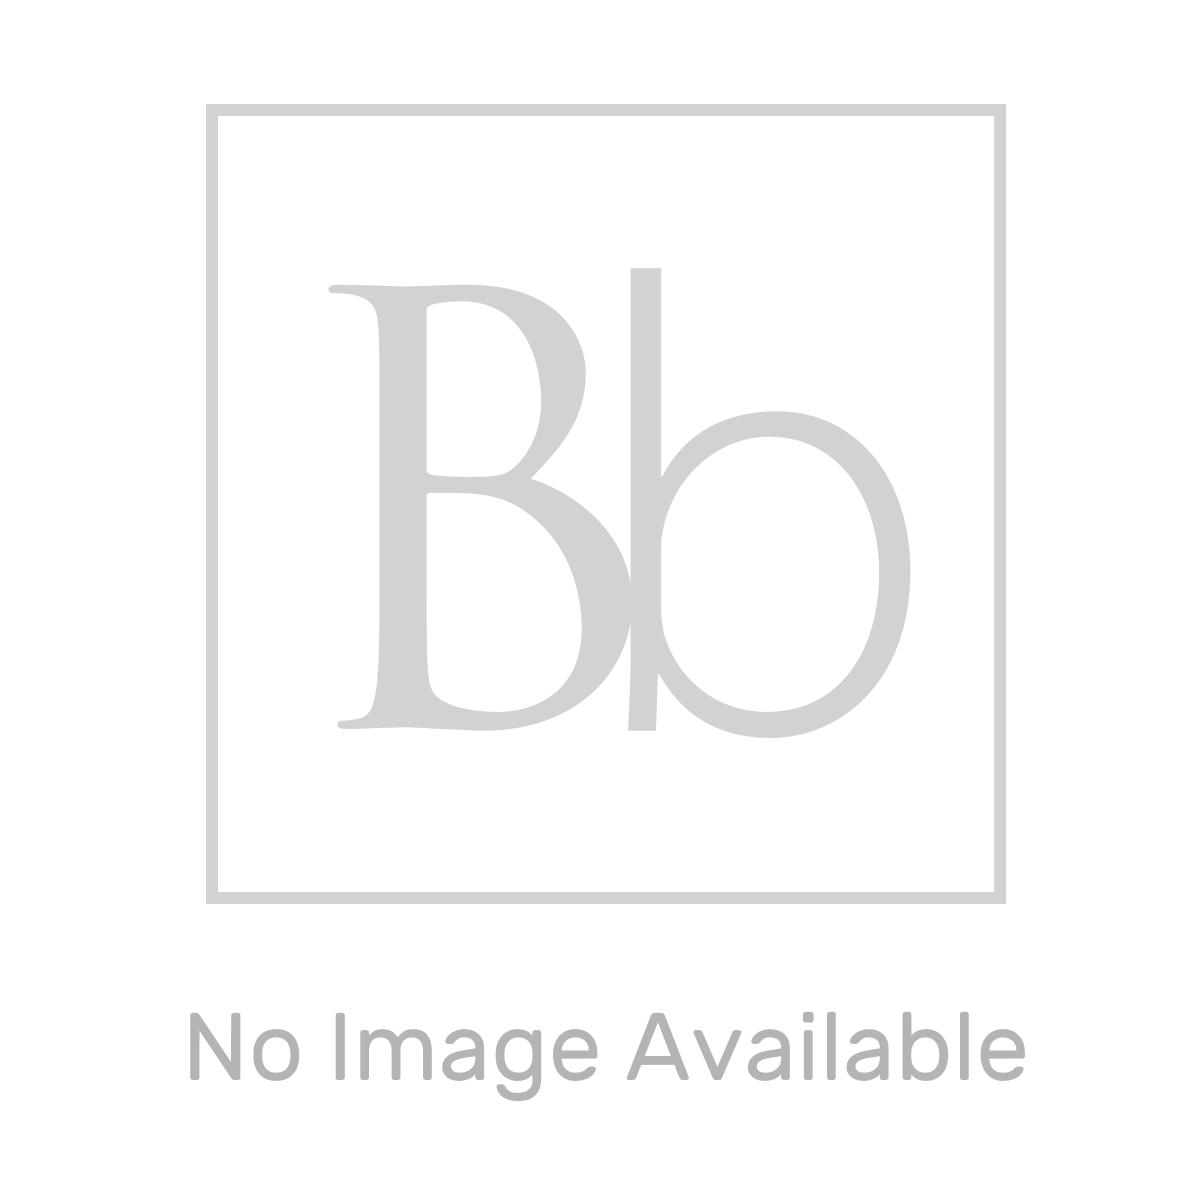 Nuie Merit Natural Oak Wall Hung Single Door Vanity & Basin 500mm Line Drawing